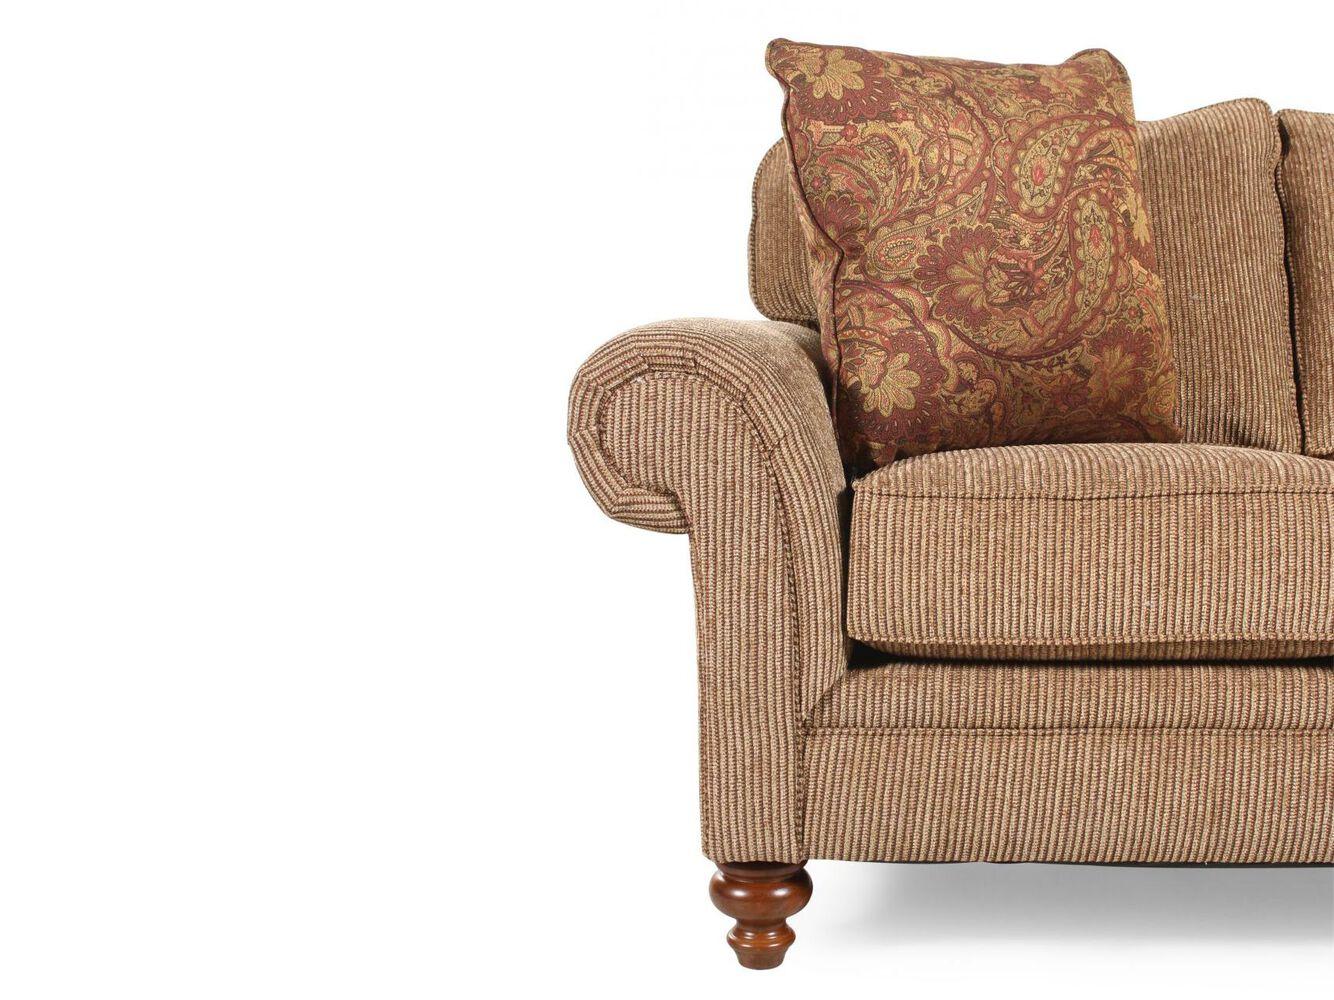 Broyhill larissa sofa mathis brothers furniture for Mathis brothers living room furniture